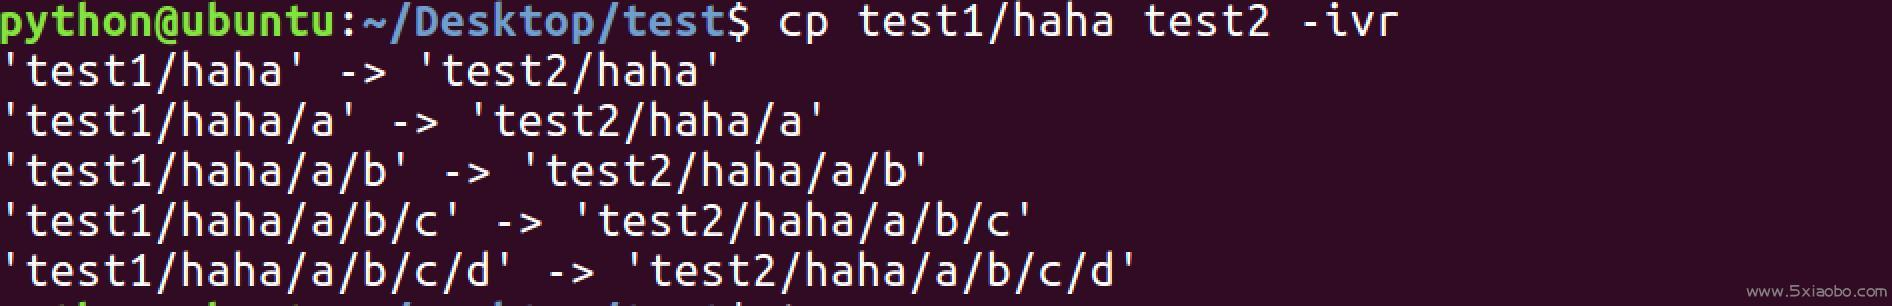 认识Linux命令--文件、磁盘管理  Linux 命令 第24张